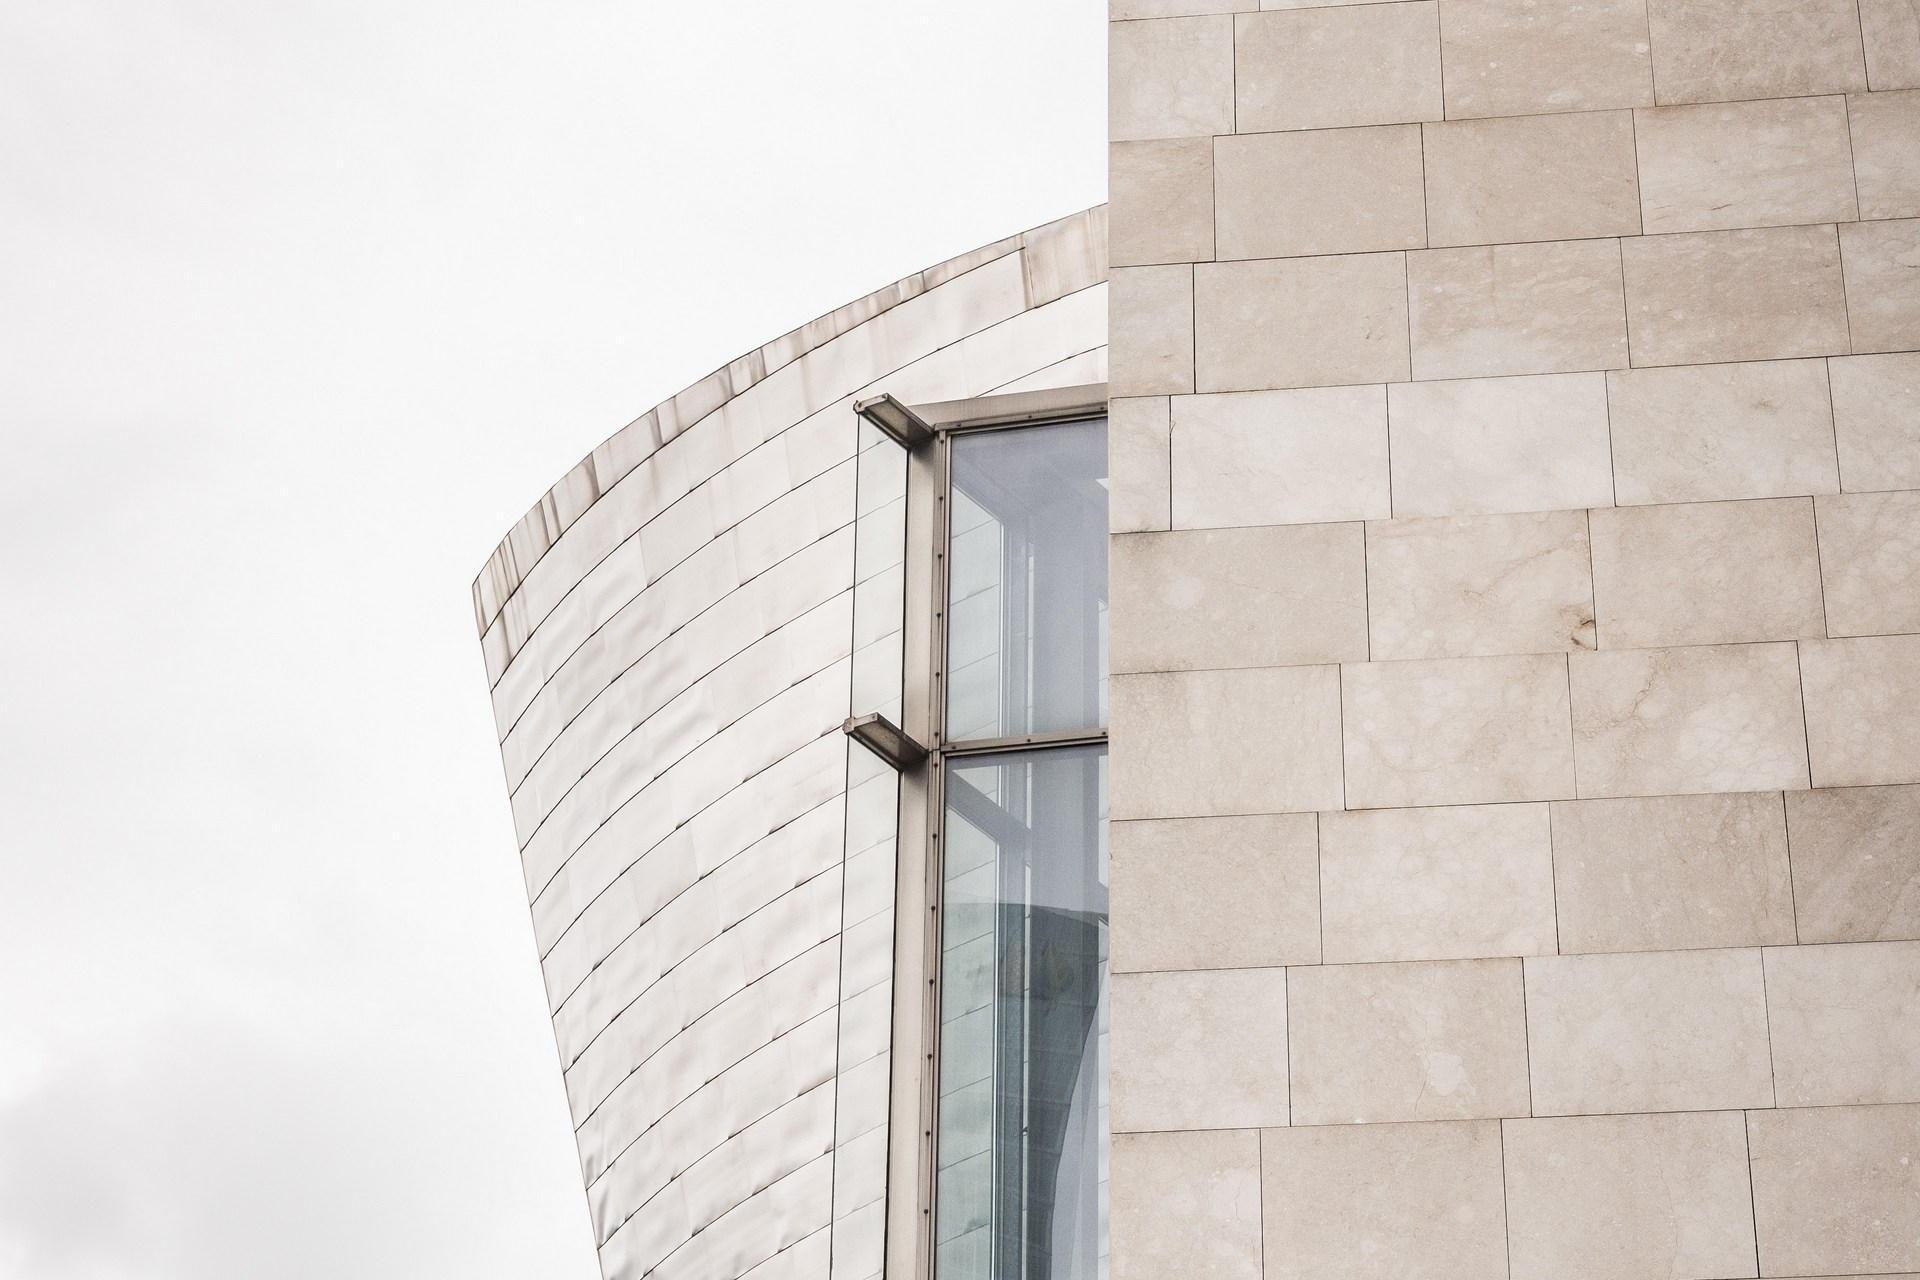 RIBA International Prize 2018: World's best new buildings revealed